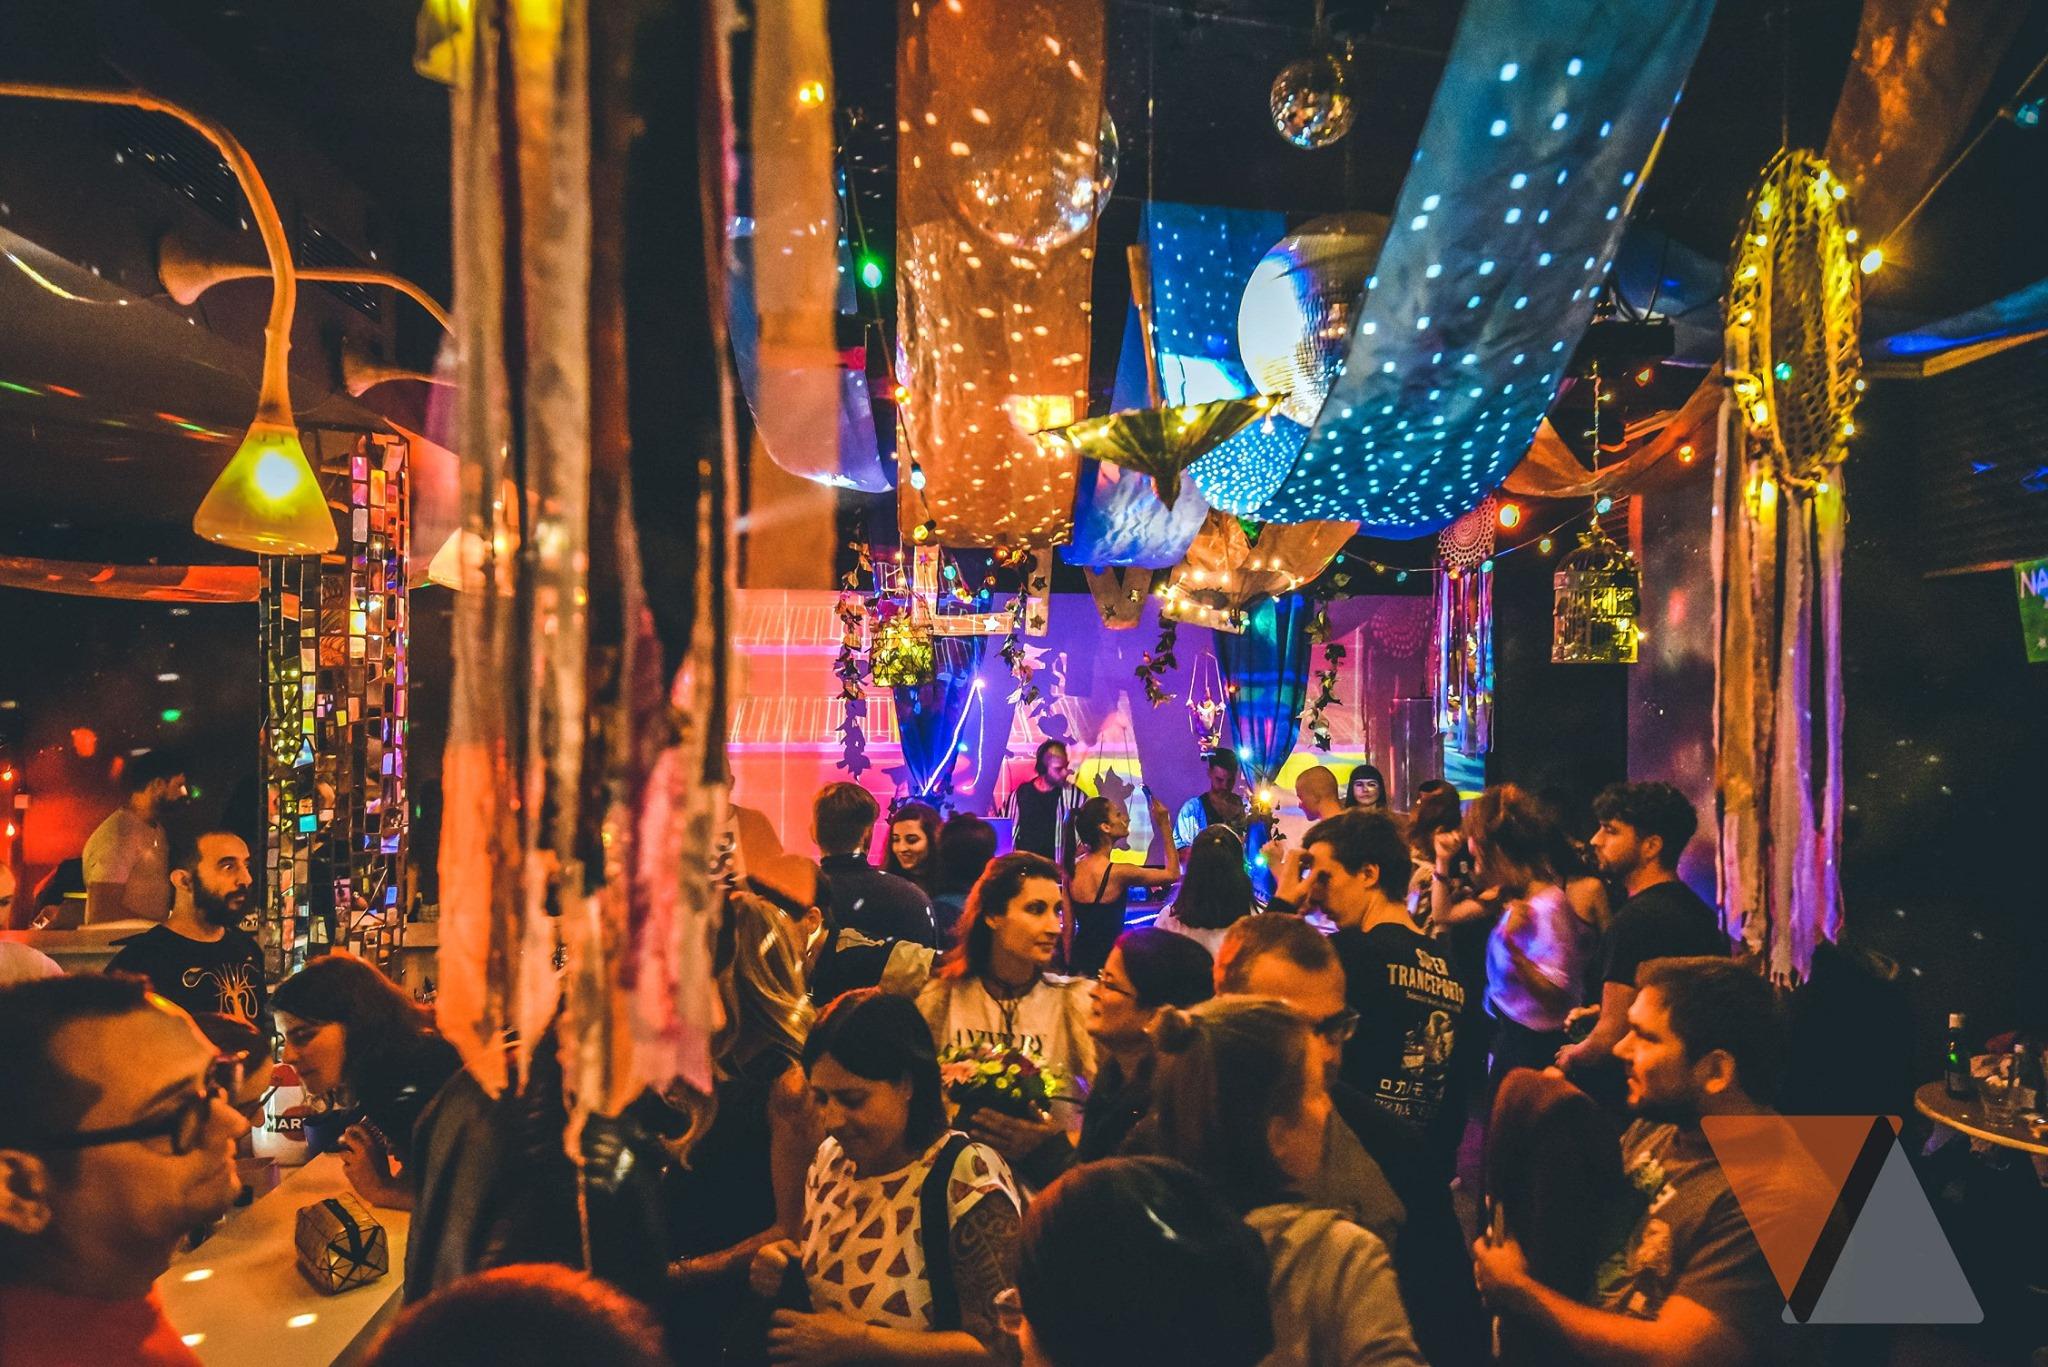 Party at a LGBT-friendly bar in Sofia Bulgaria